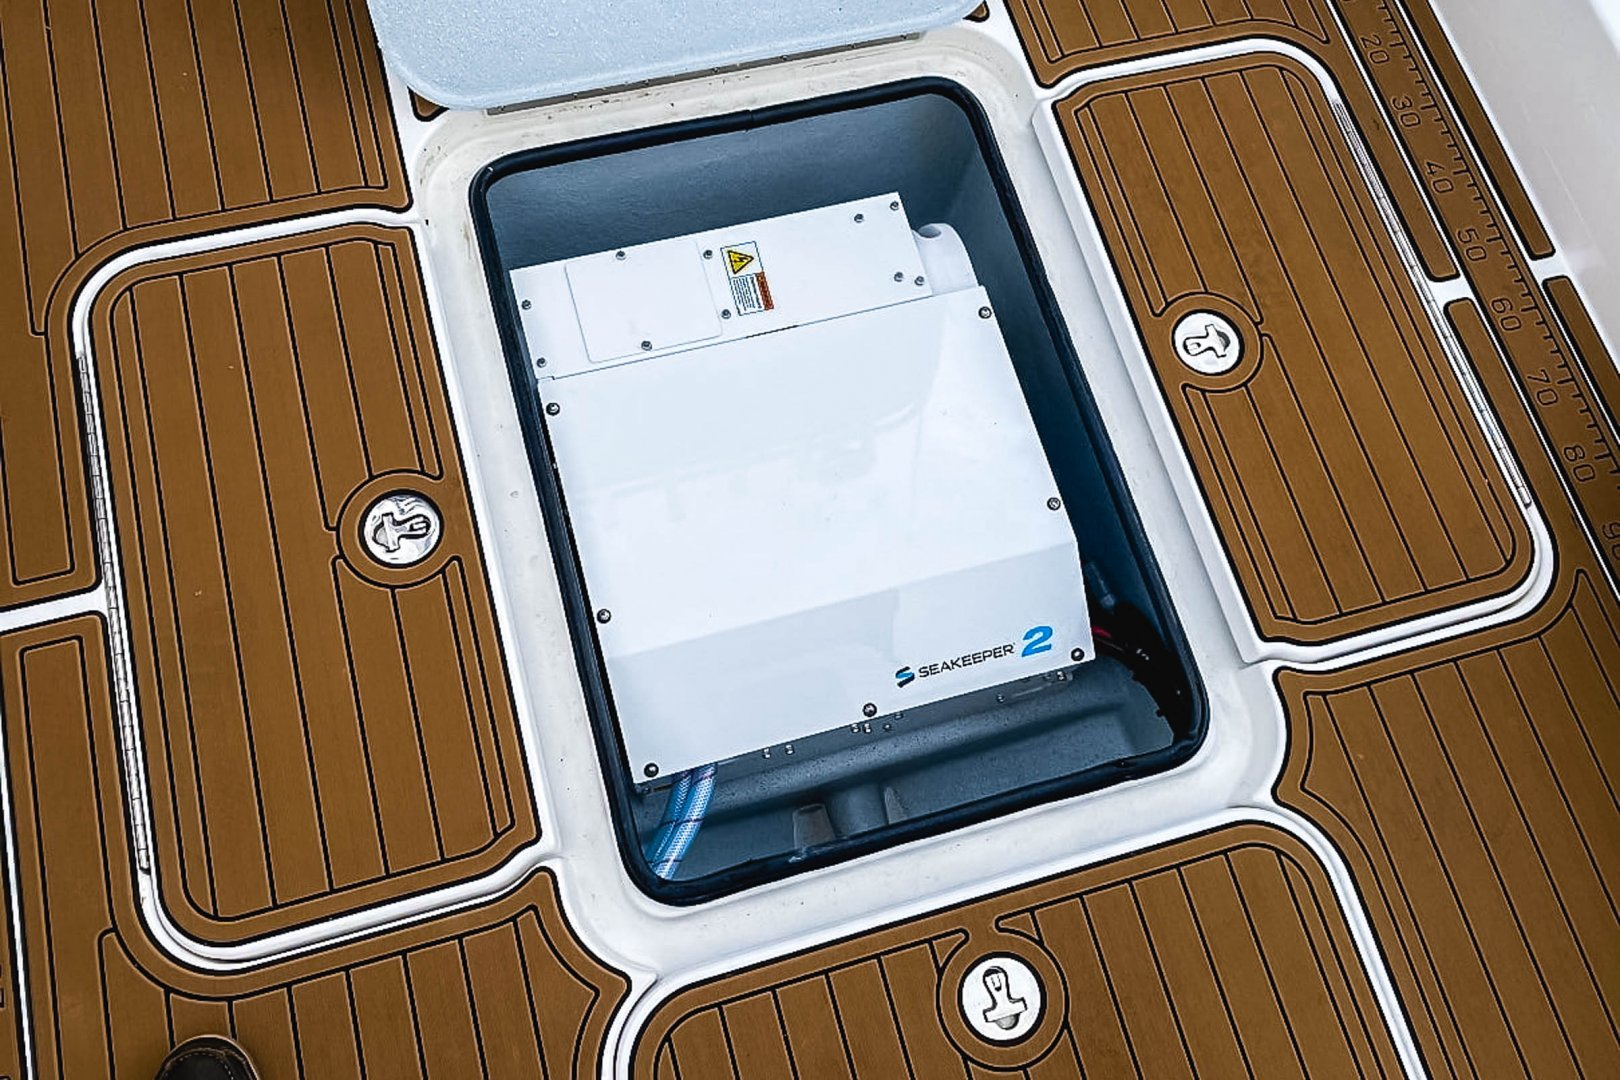 9 PB Seakeeper 2_web_size.jpg